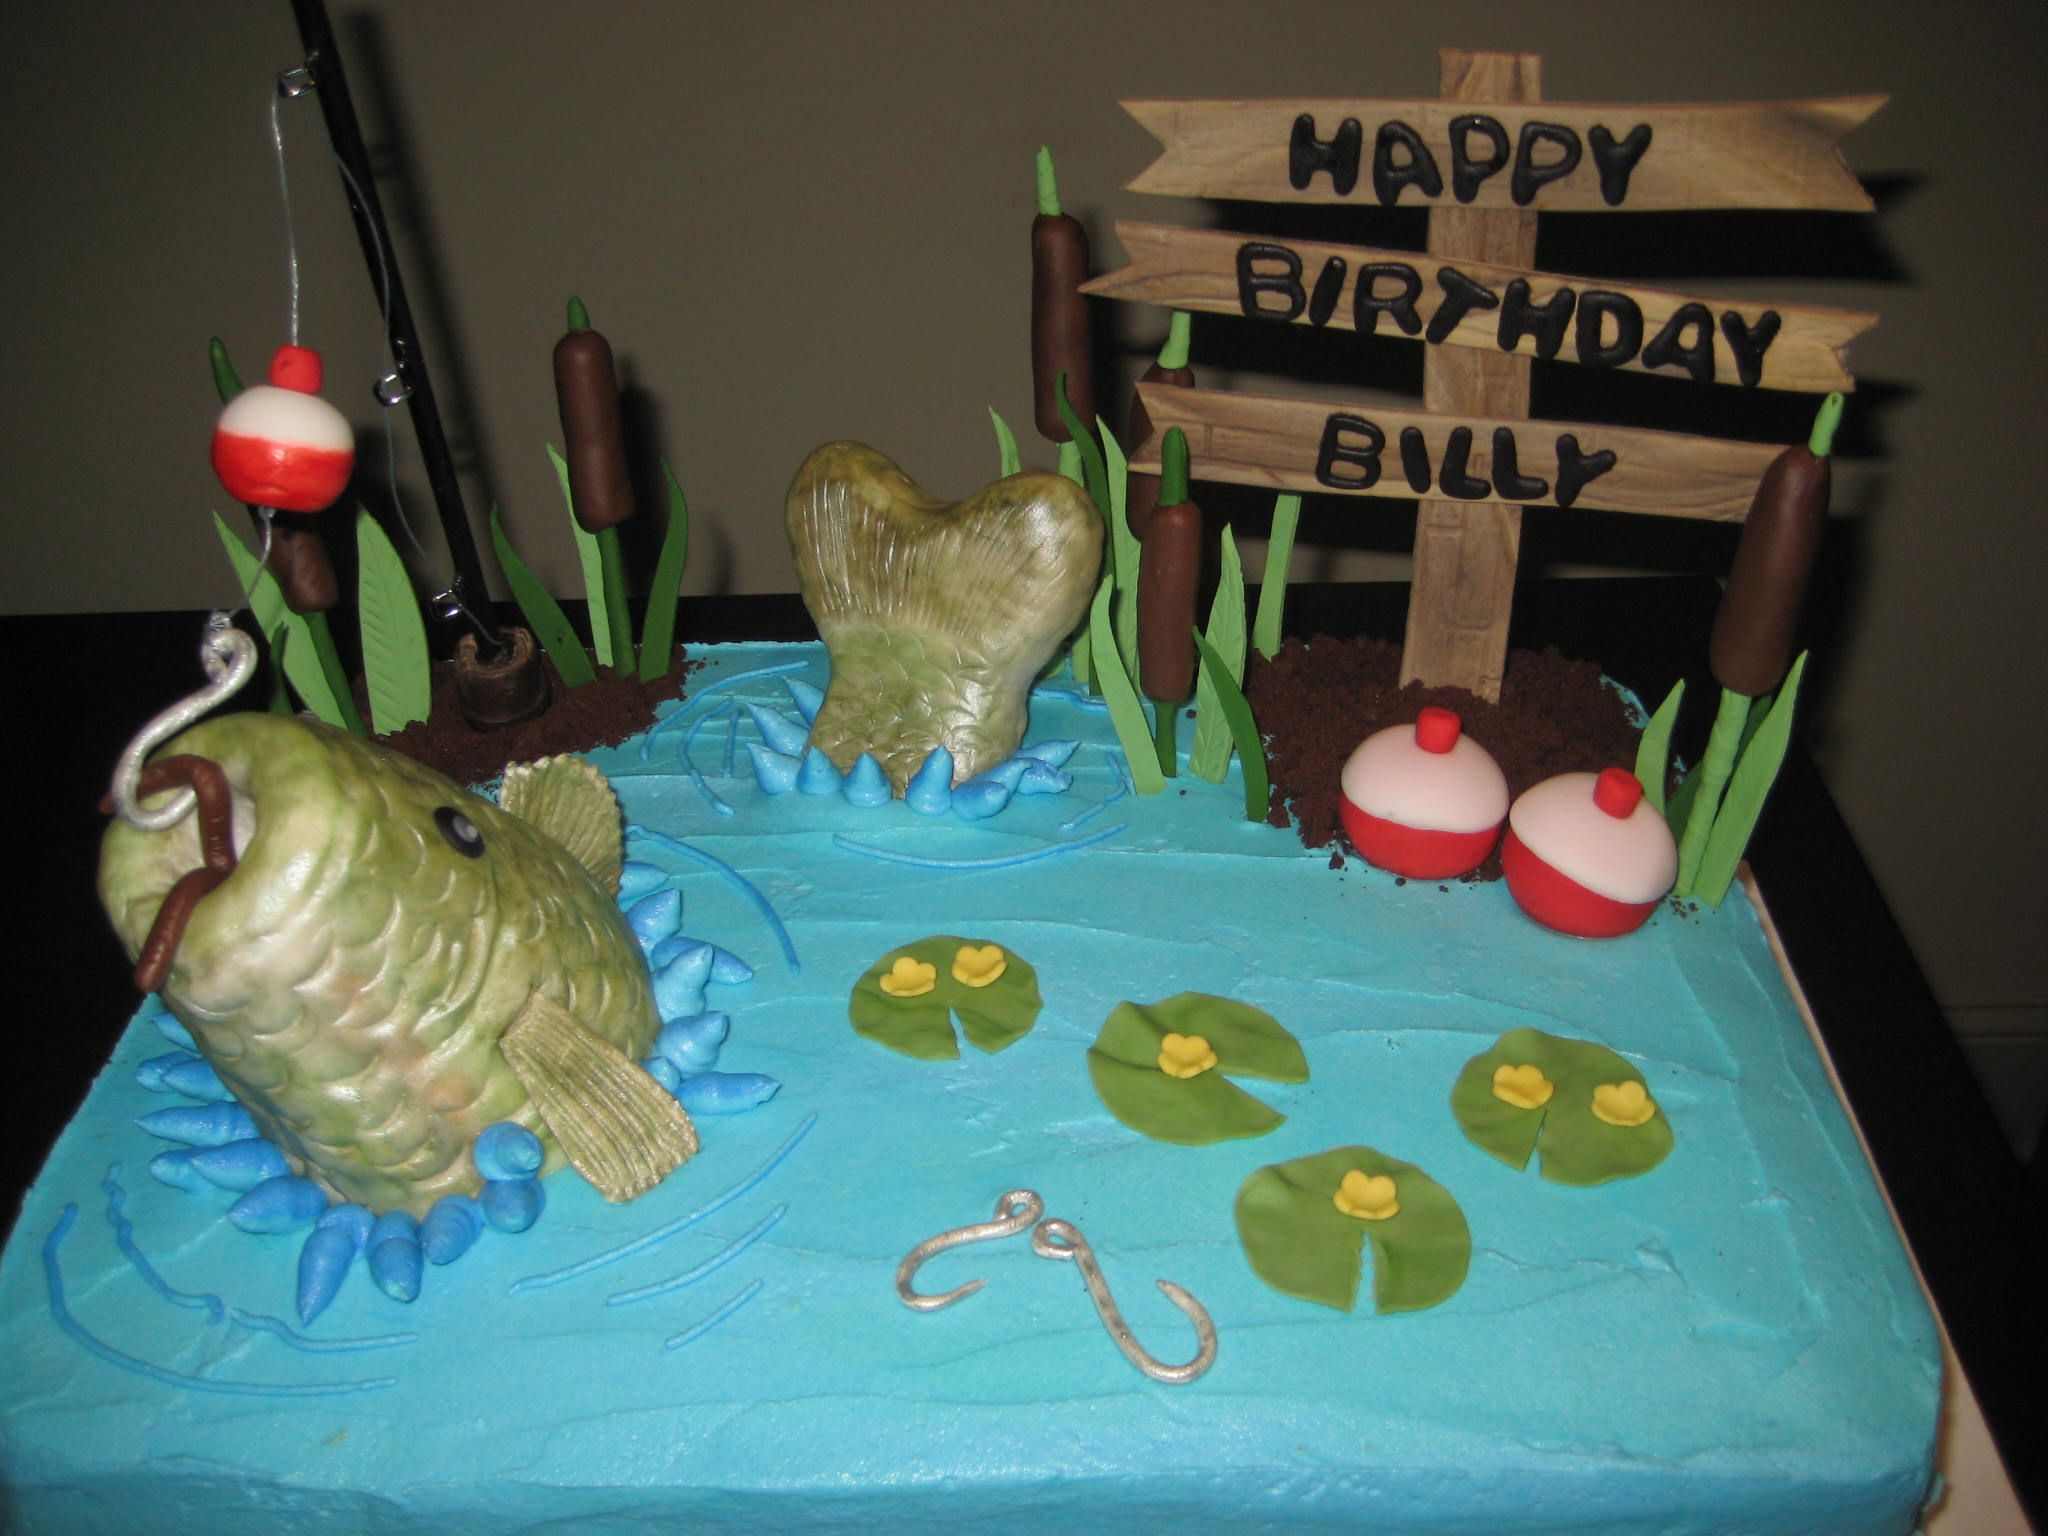 Remarkable Fishing Theme Fish Cake Birthday Fishing Theme Birthday Birthday Cards Printable Opercafe Filternl